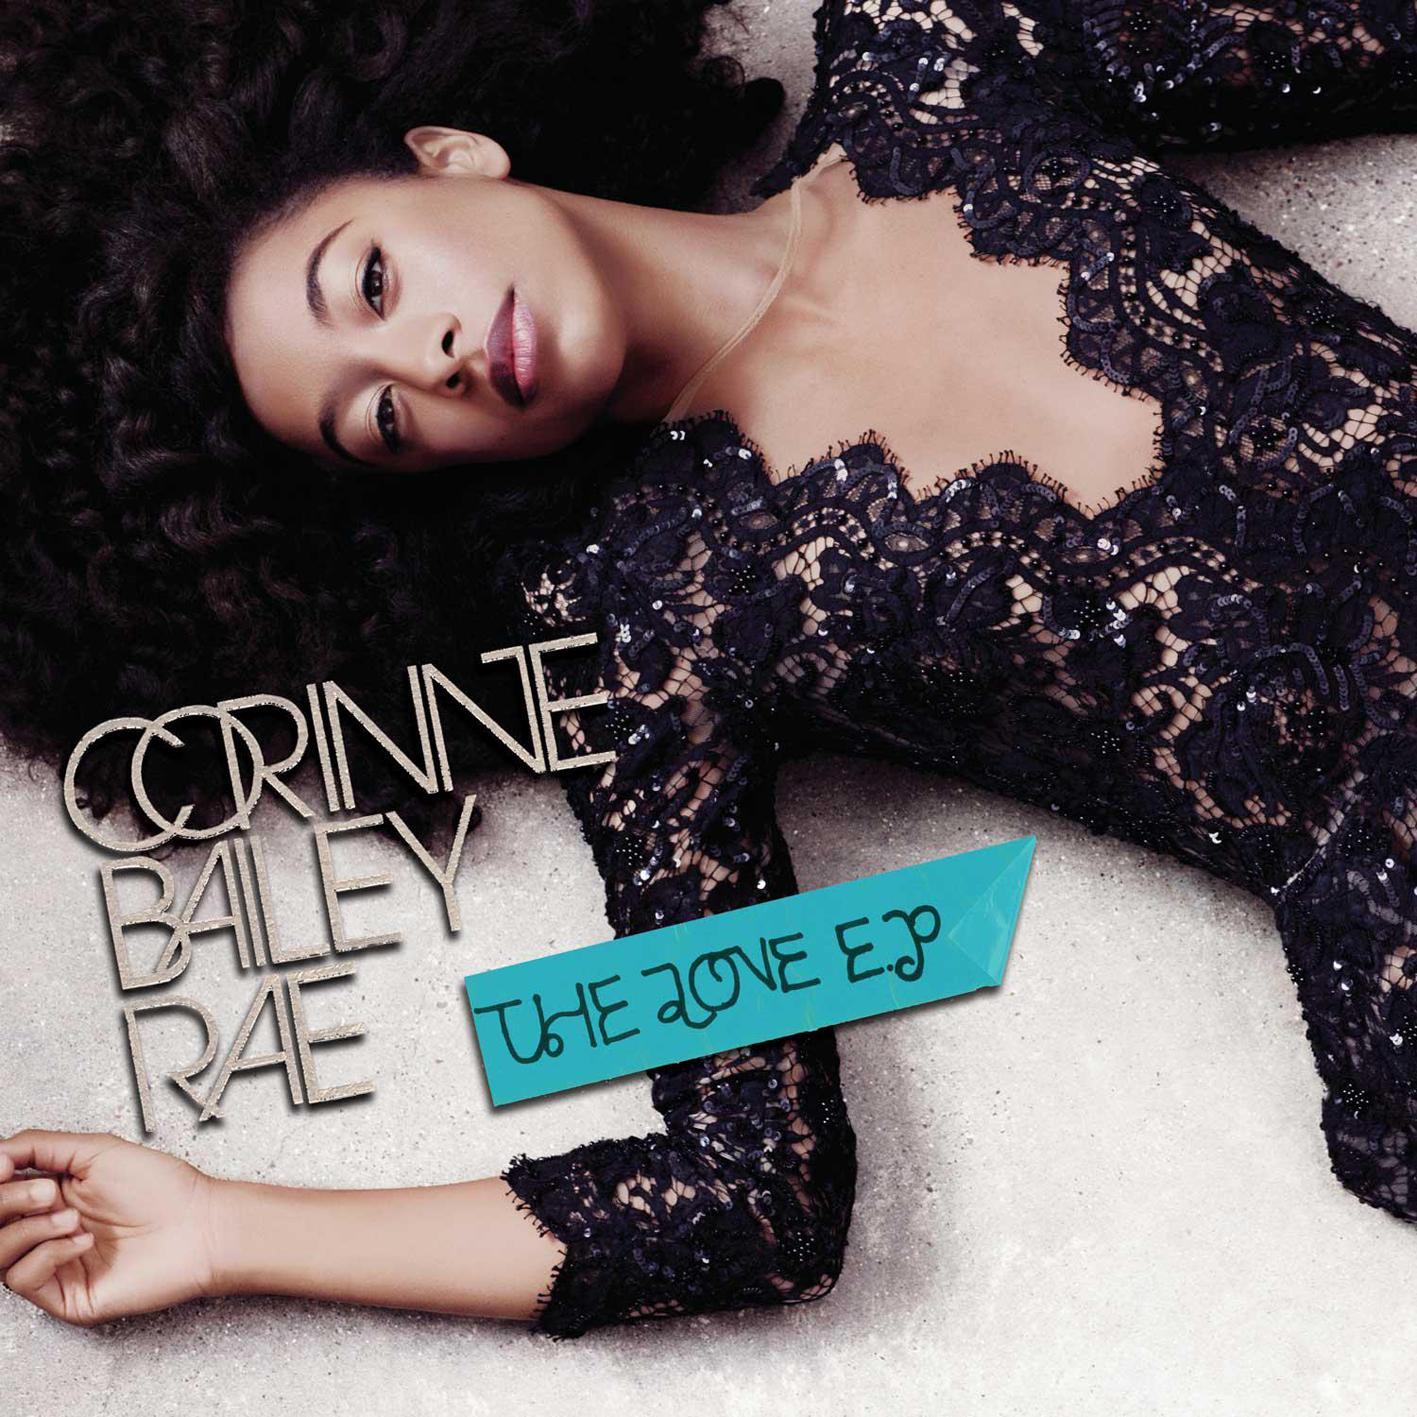 corinne-bailey-rae-love-ep